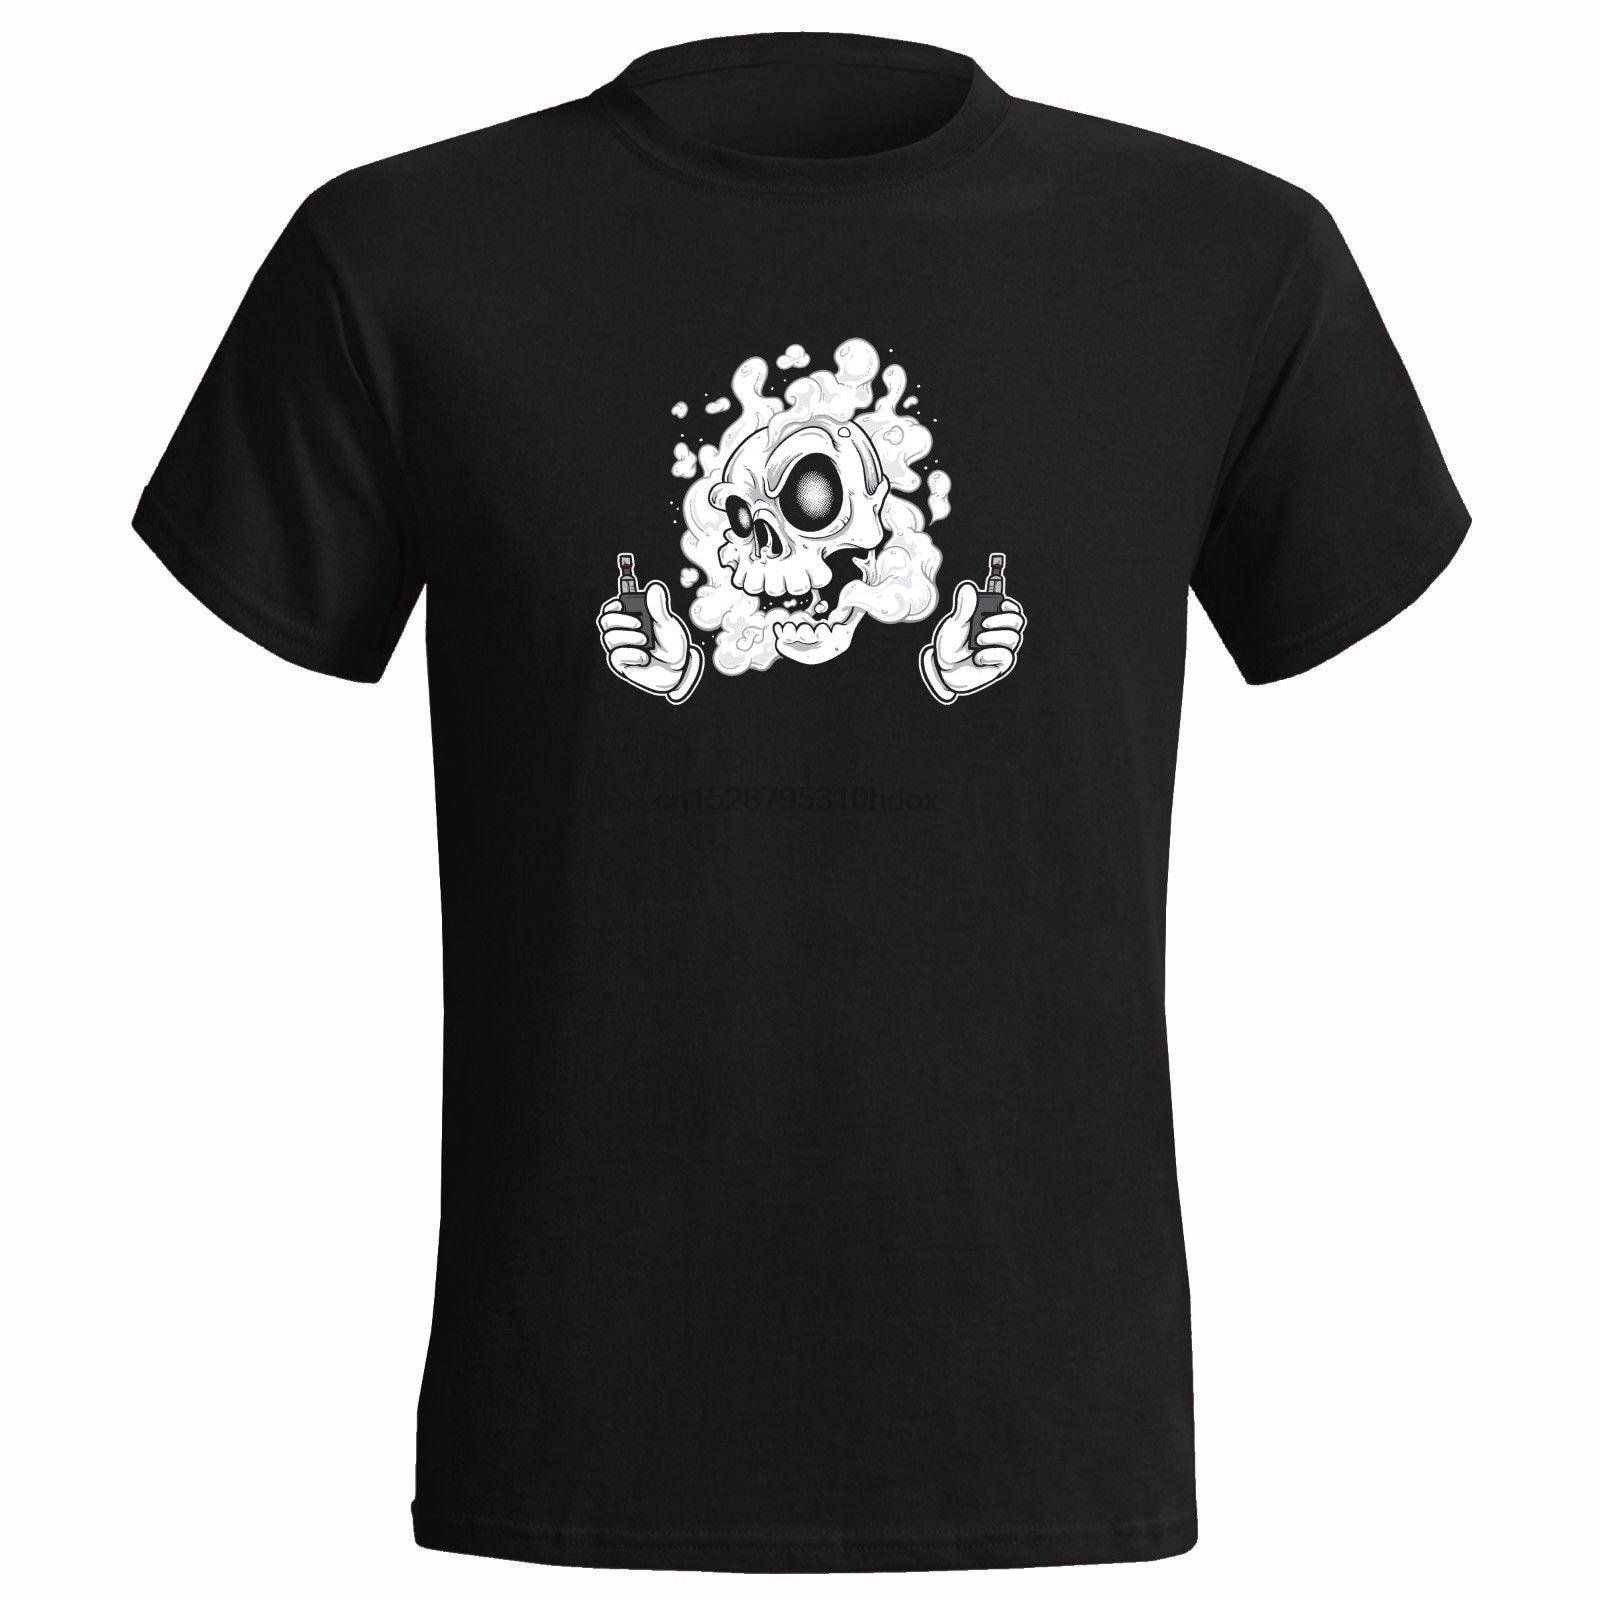 Dos Mod cazador de nubes para hombre Camiseta vaper vape cráneo esqueleto amor a fumar regalo (1)